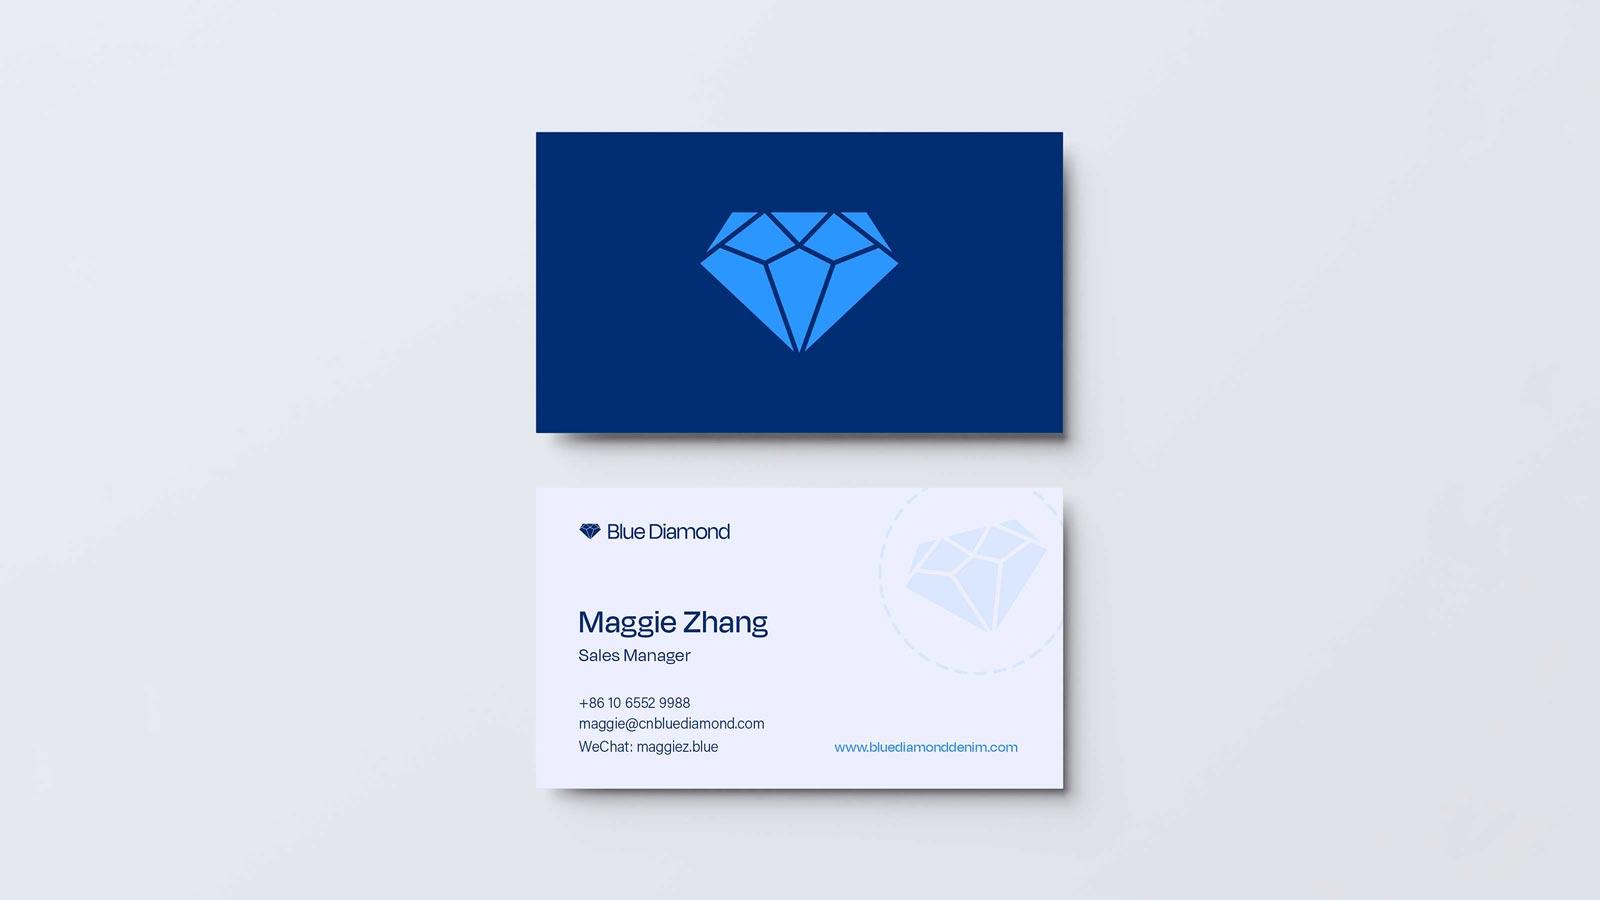 Blue Diamond business cards mockup